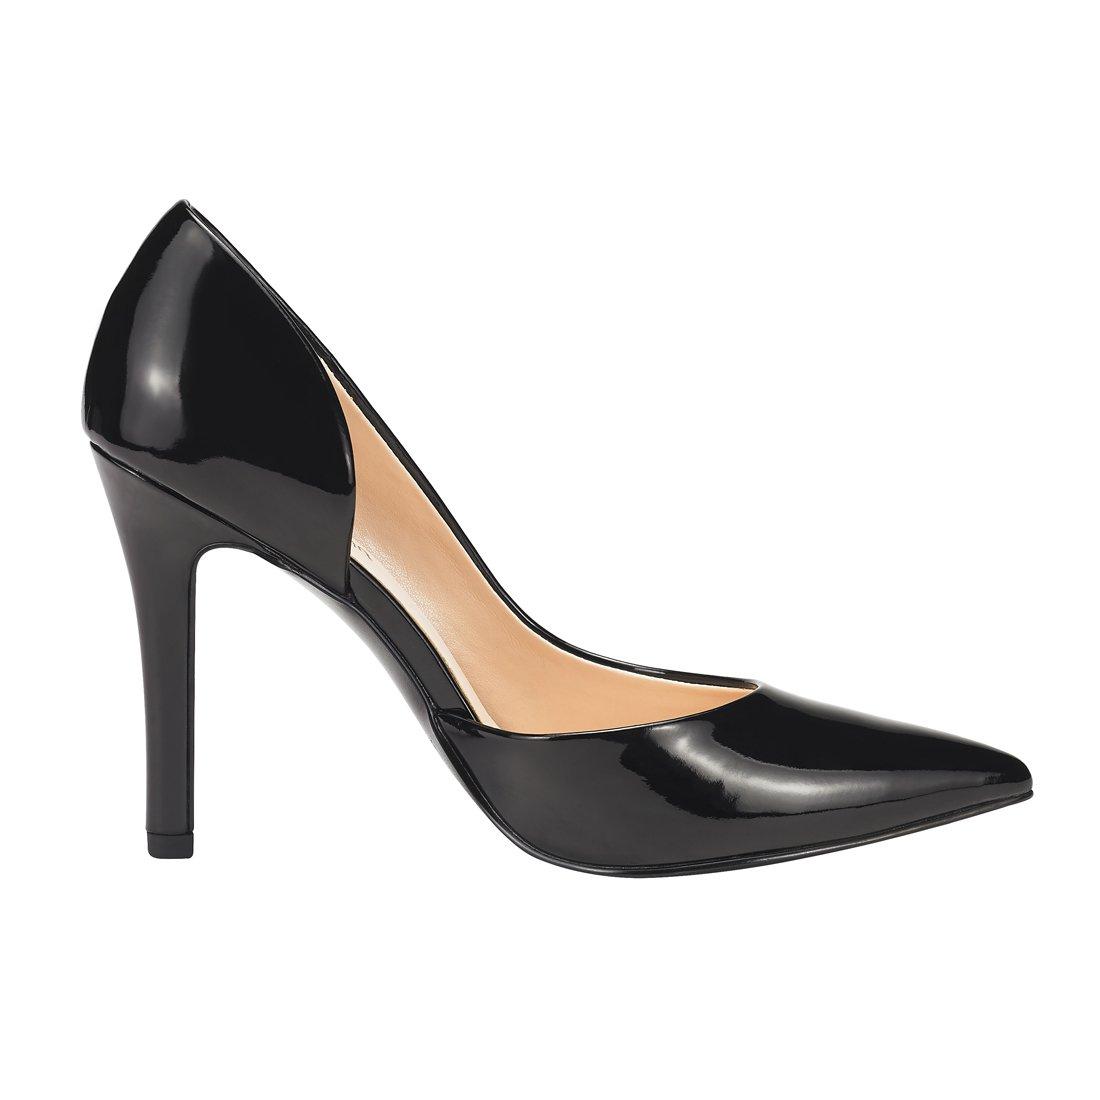 Pointed JENN ARDOR Stiletto High Heel Shoes for Women Closed Toe Classic Slip On Dress Pumps